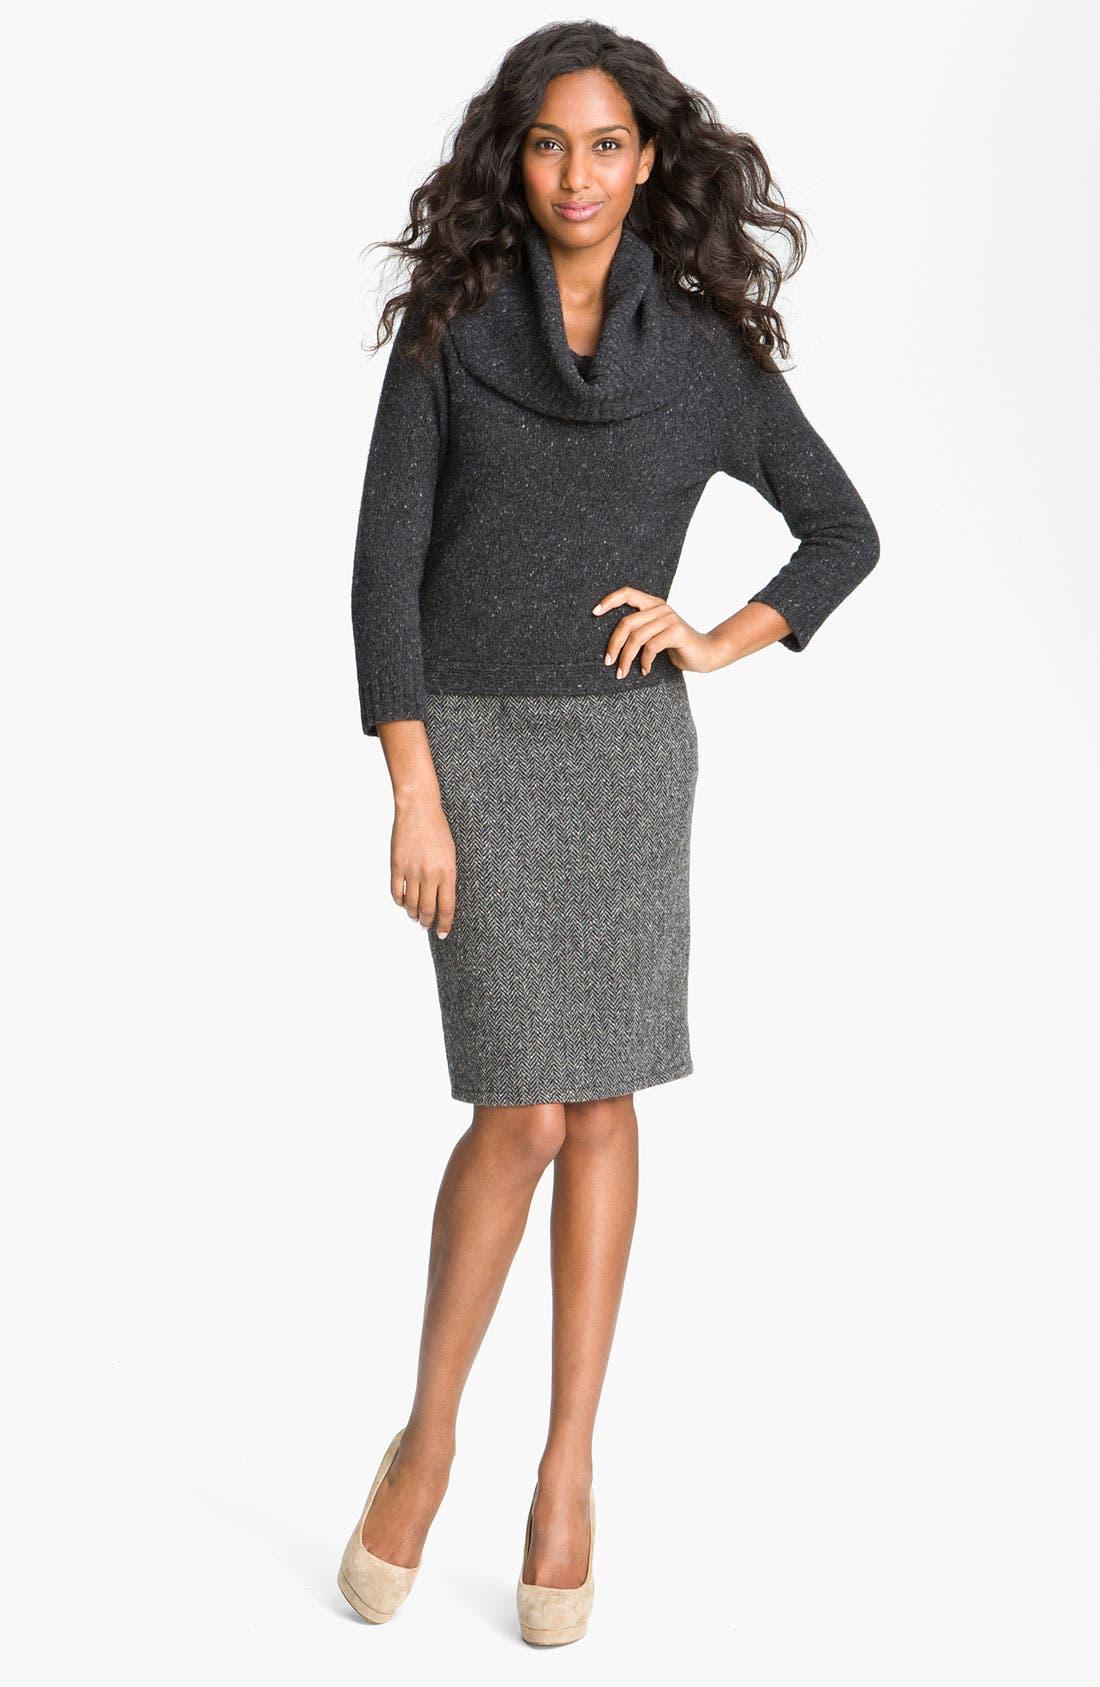 Alternate Image 1 Selected - Weekend Max Mara 'Rosano' Knit Dress